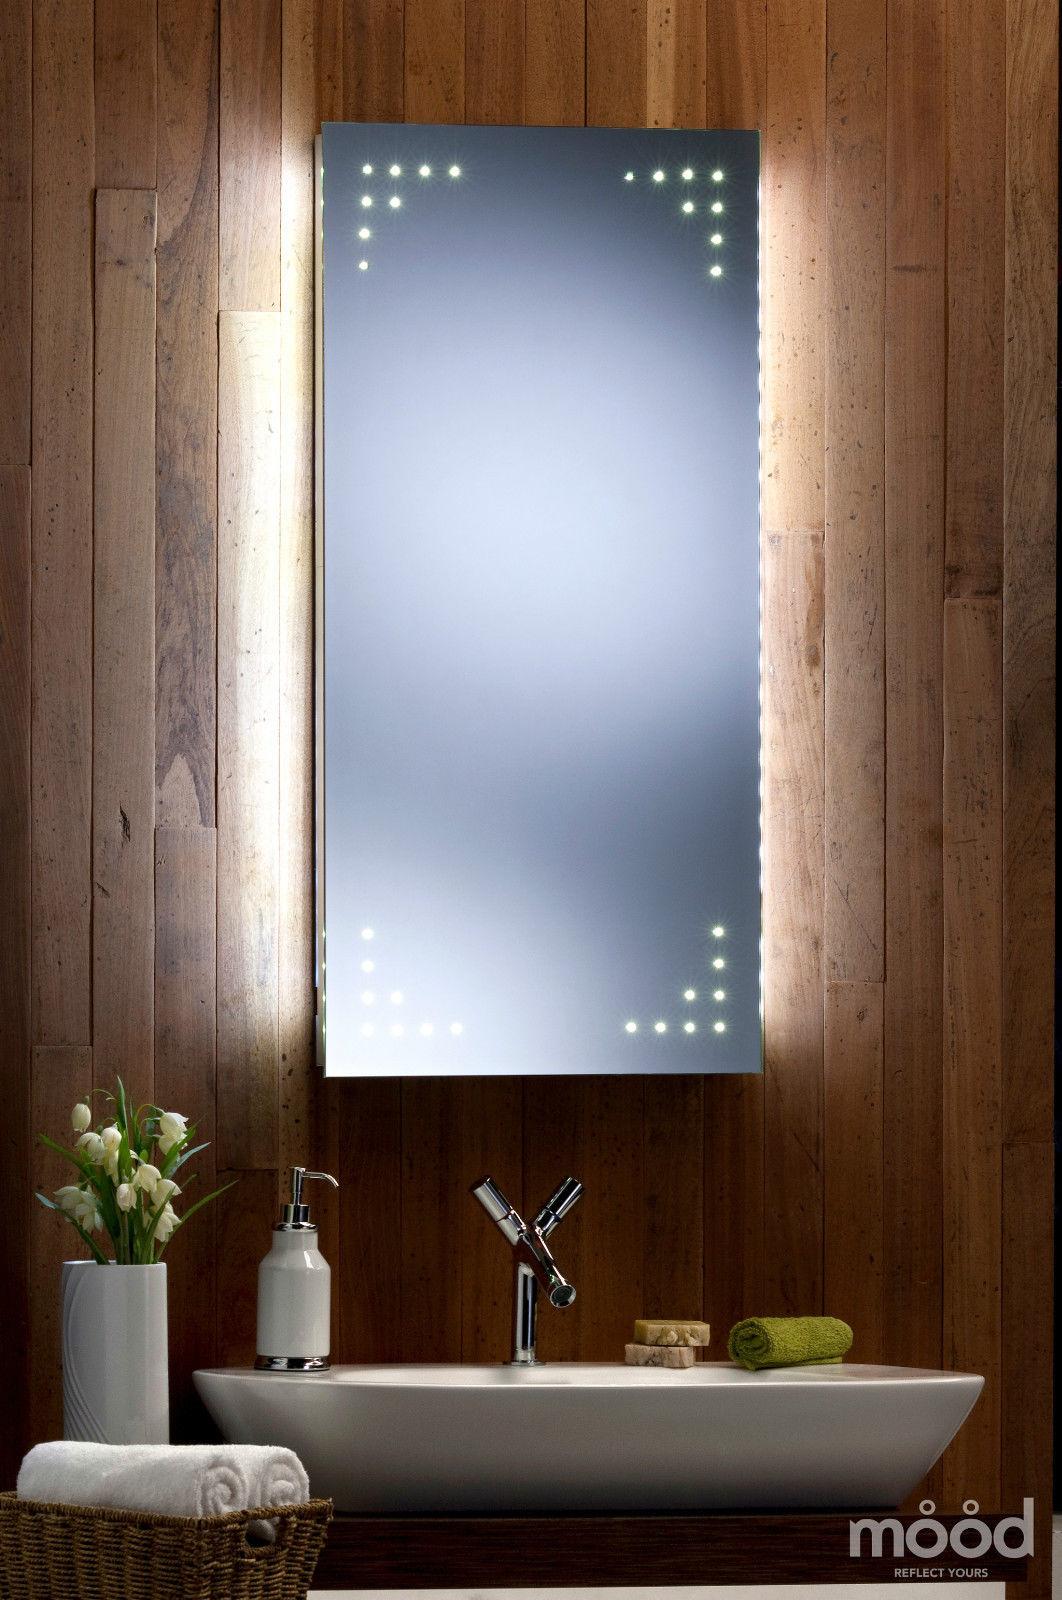 Bathroom mirror shaver ambient white glow 50cm x 100cm led for Miroir 50 x 100